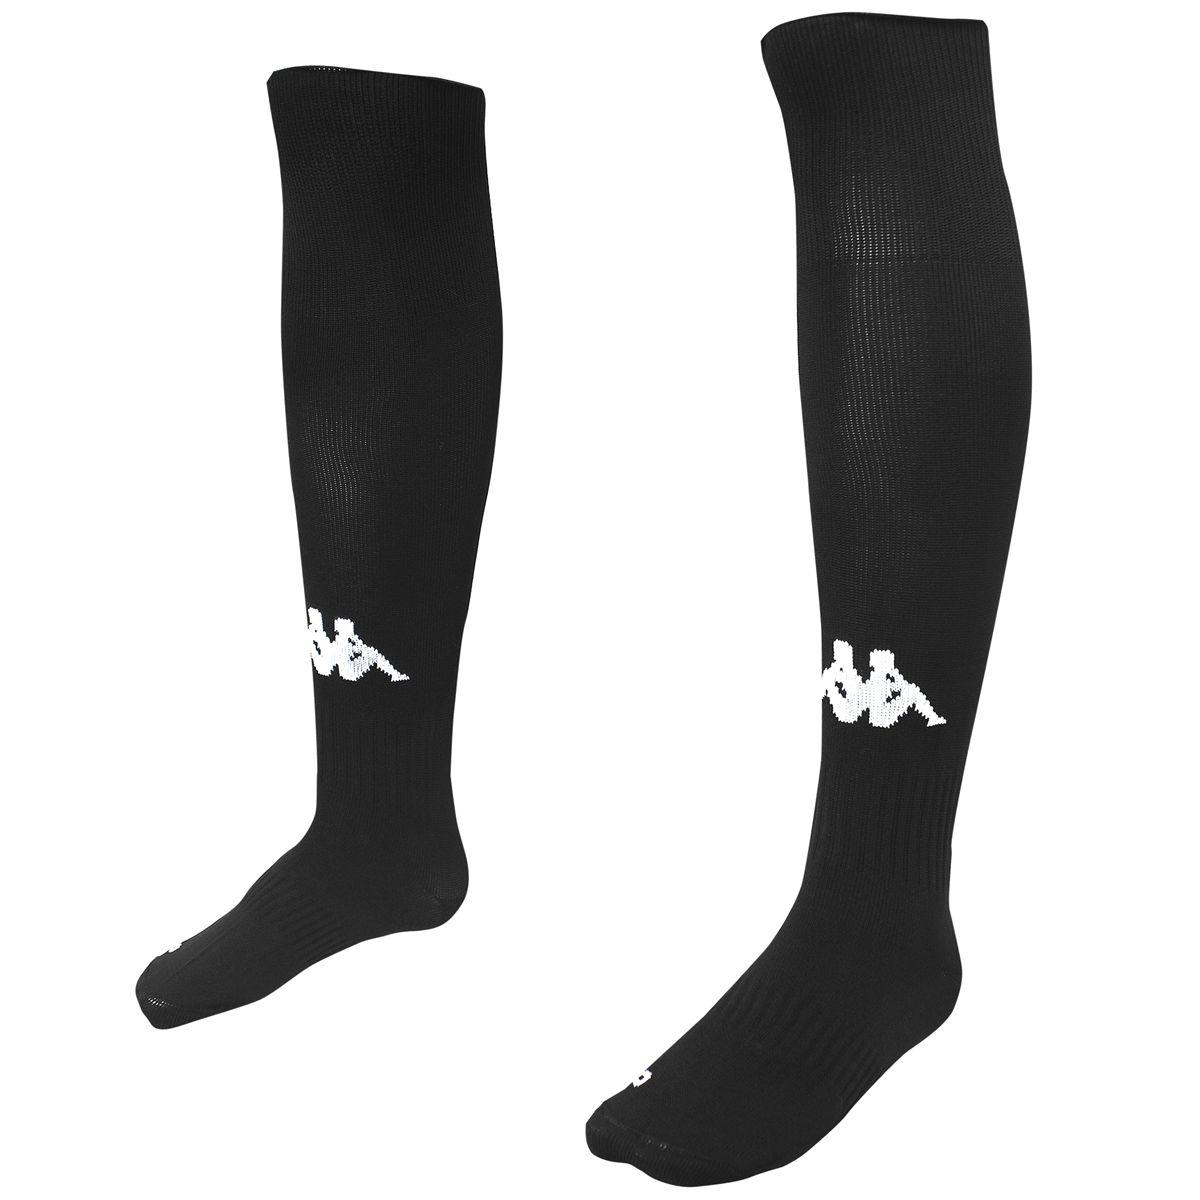 Kappa Socks KAPPA4SOCCER HIGH 1PACK Boy Knee High